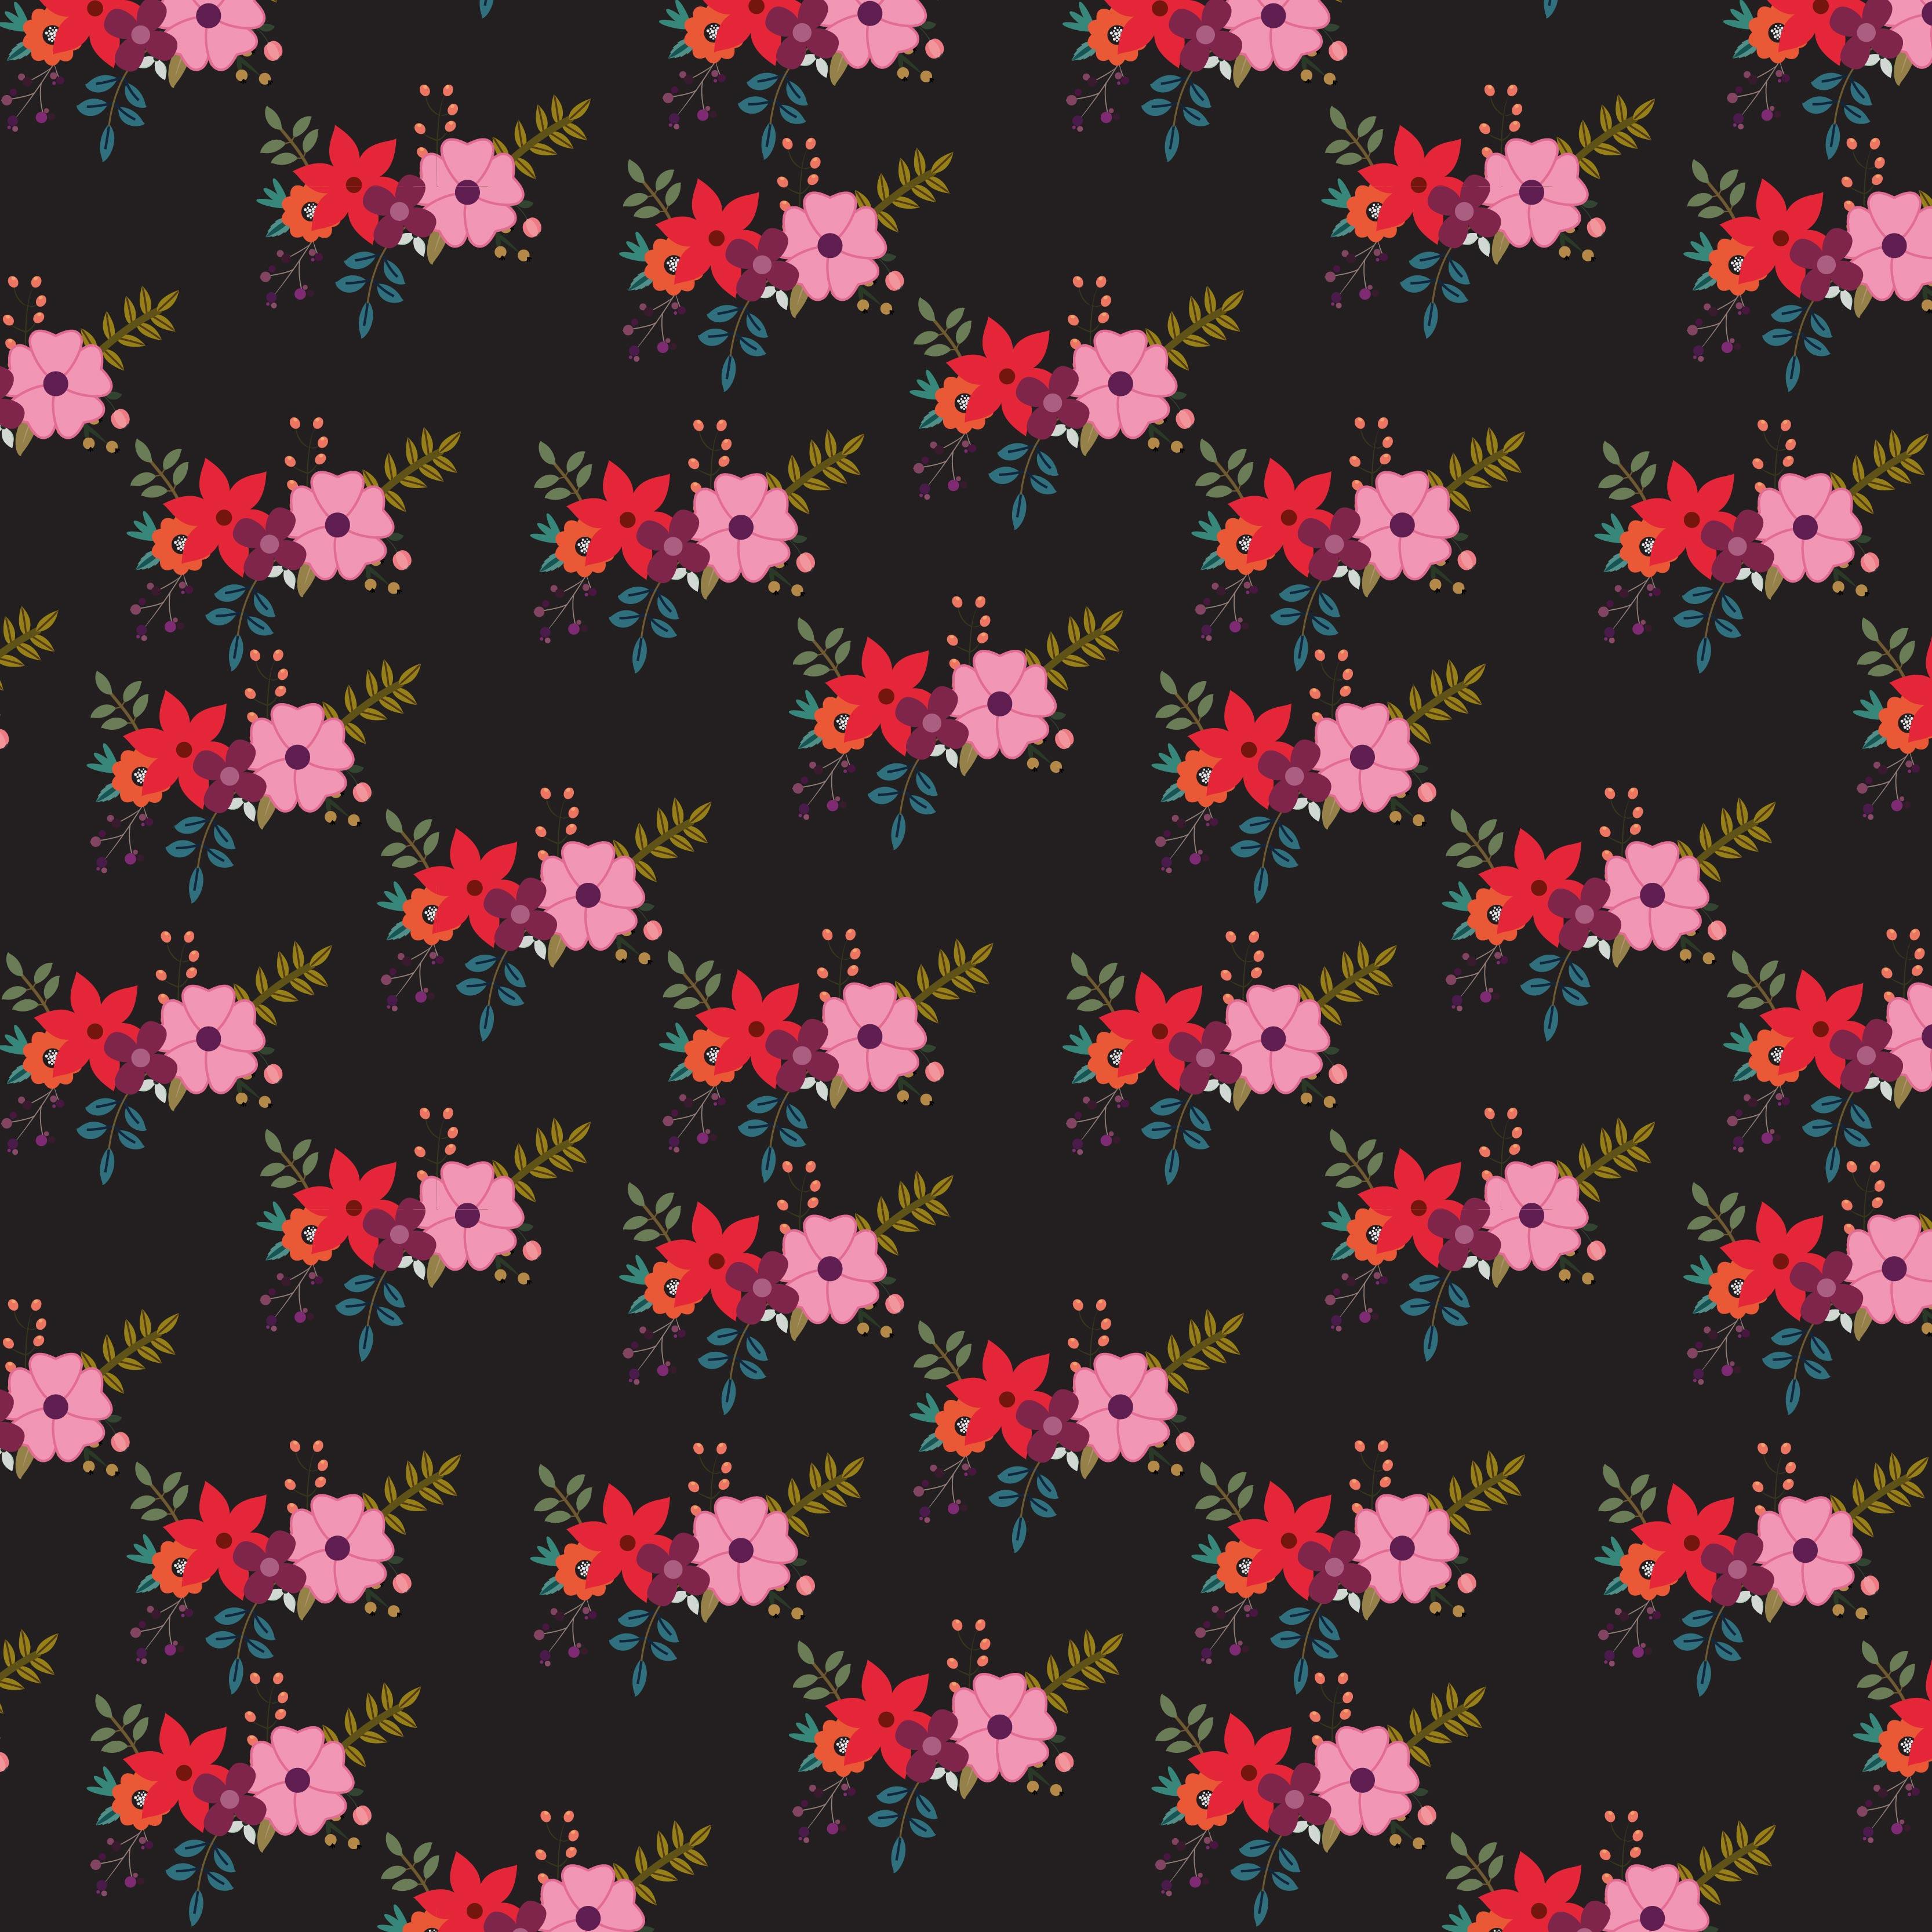 Dark Red Flowers Free Vector Art 166 Free Downloads